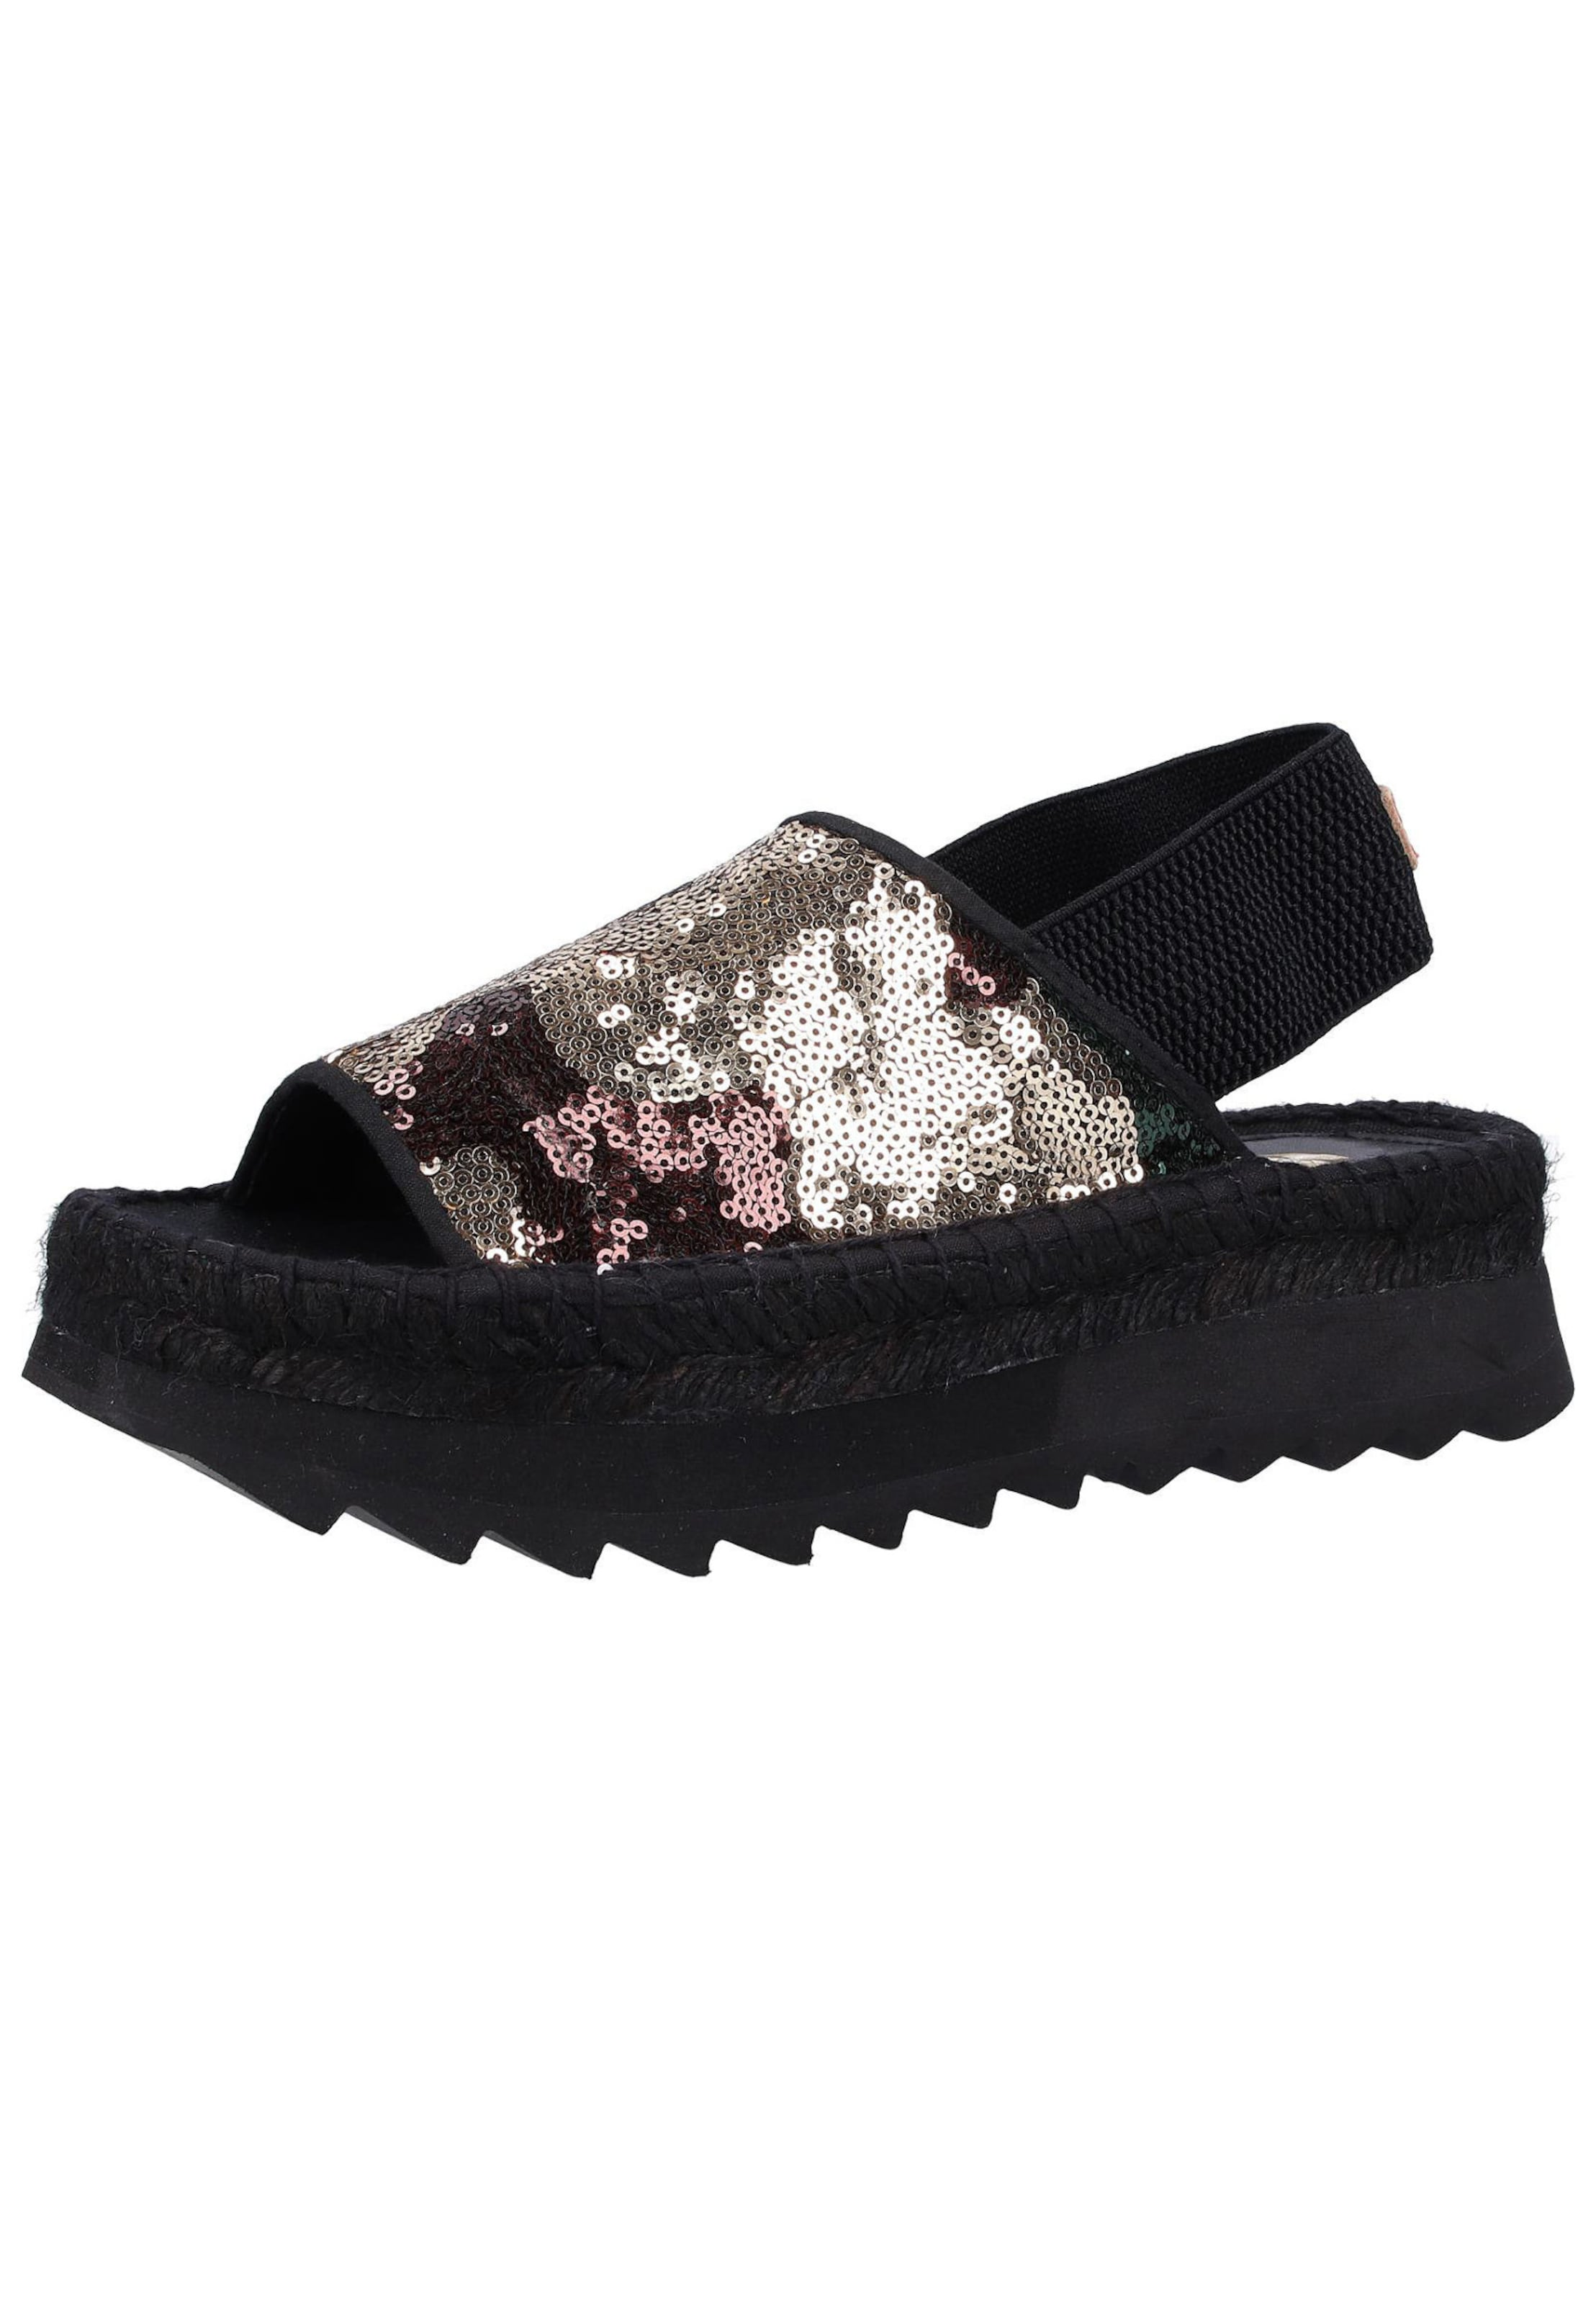 REPLAY Sandalen in schwarz   silber